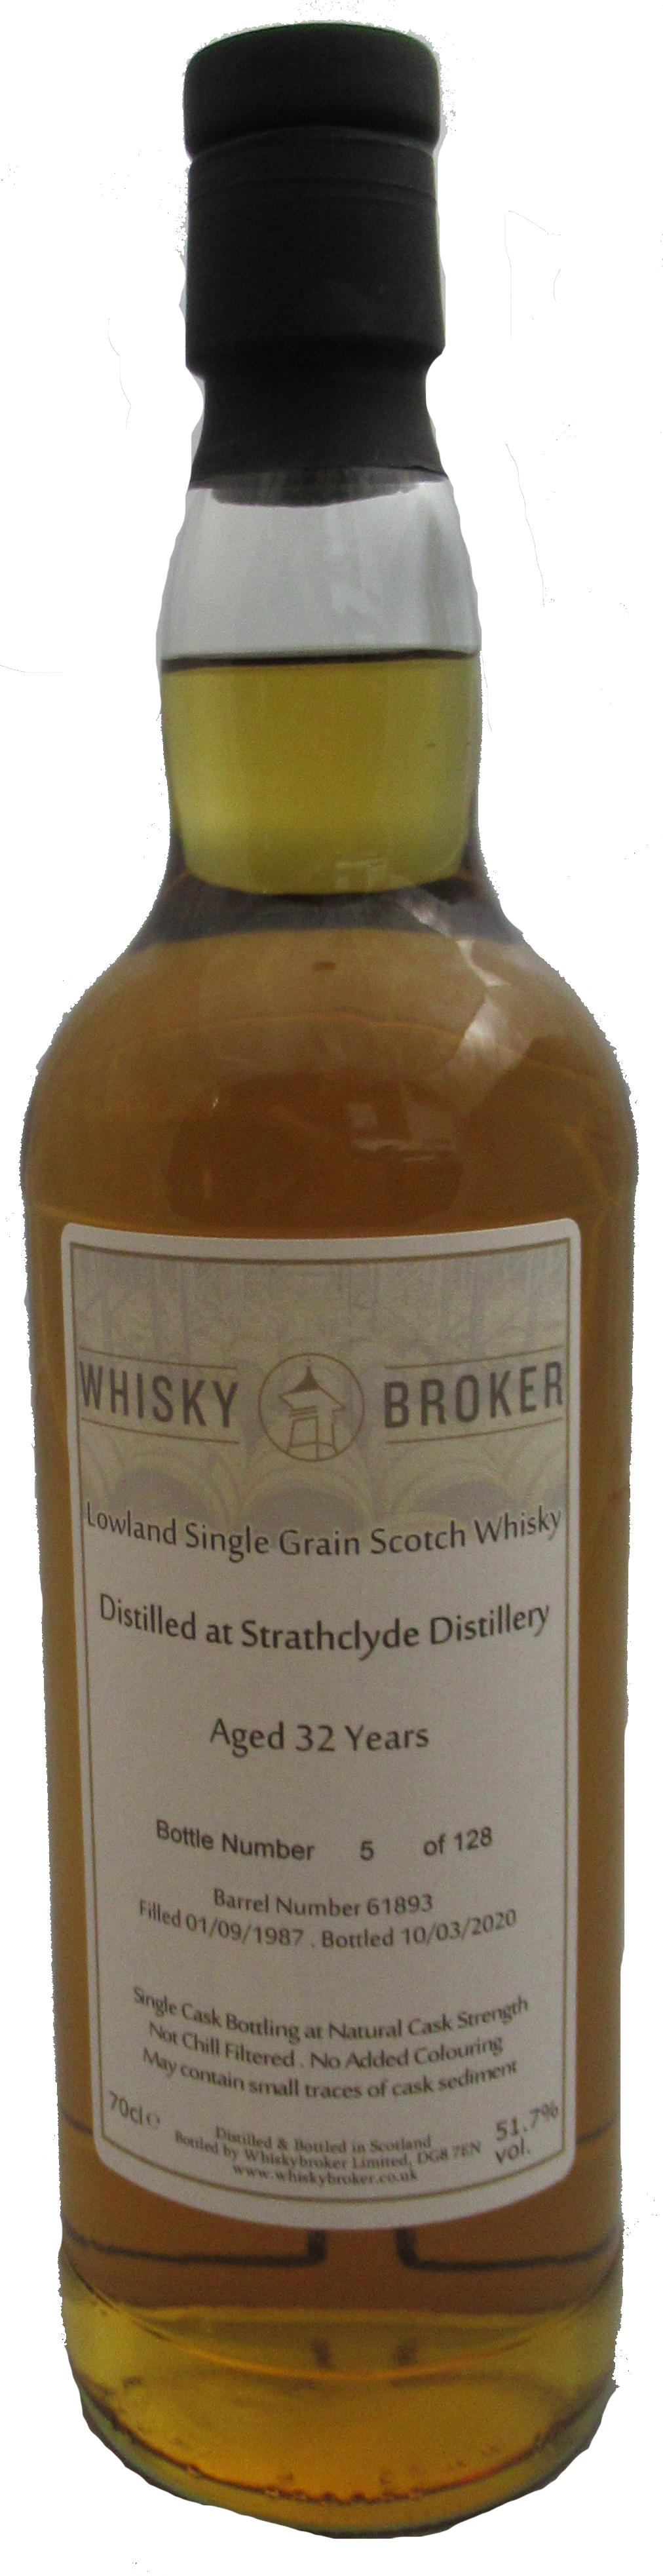 70cl, 32yo Distilled at Strathclyde Distillery